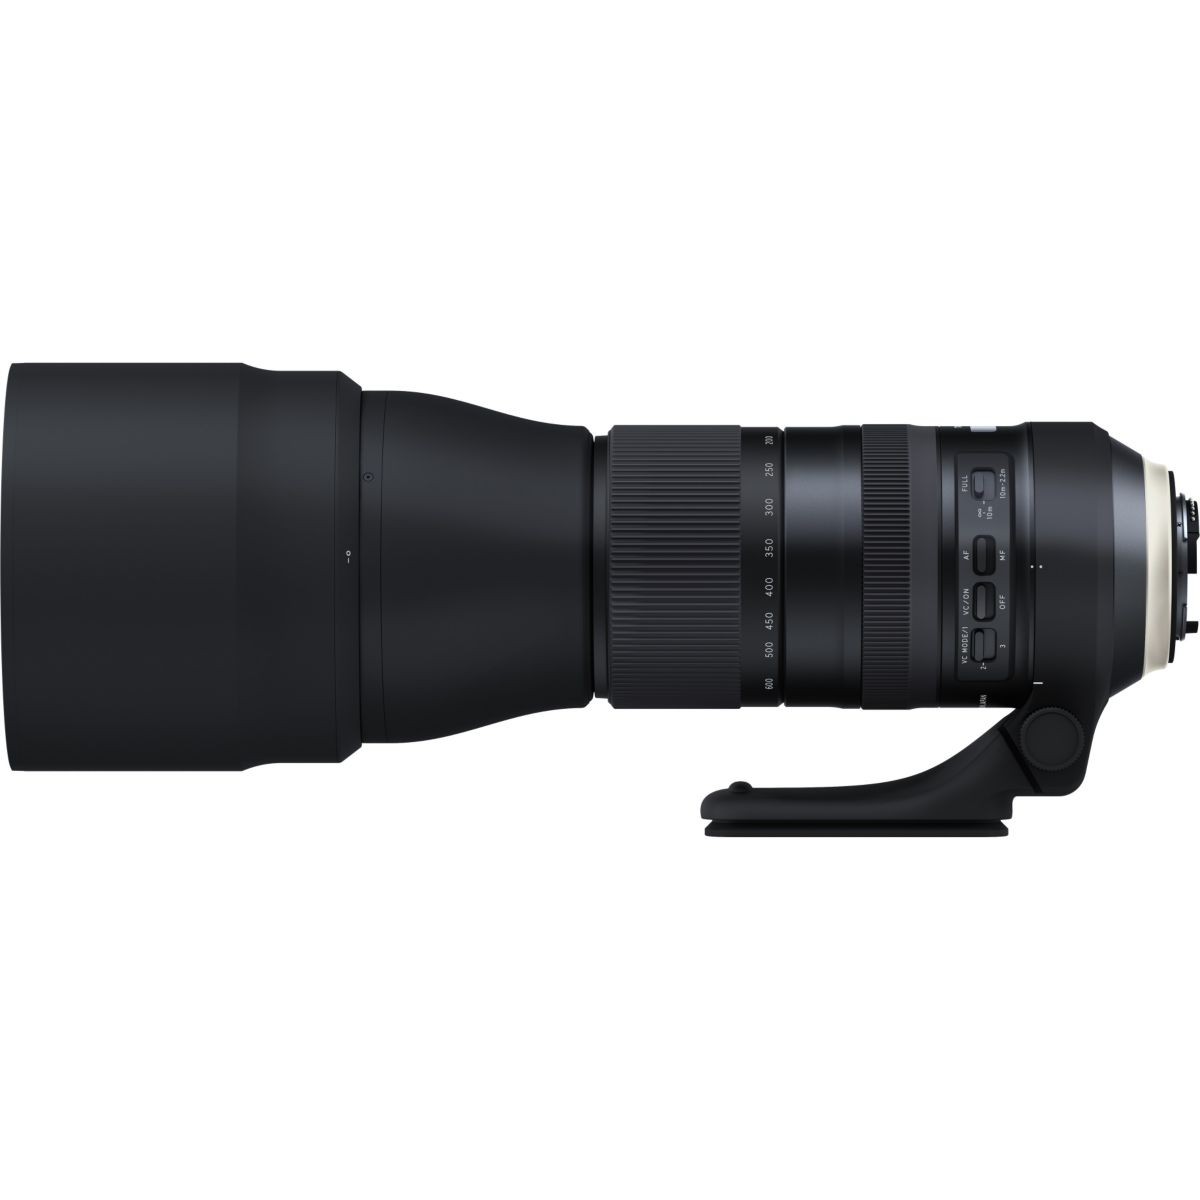 Obj TAMRON SP 150-600mm F/5-6,3 Di VC US